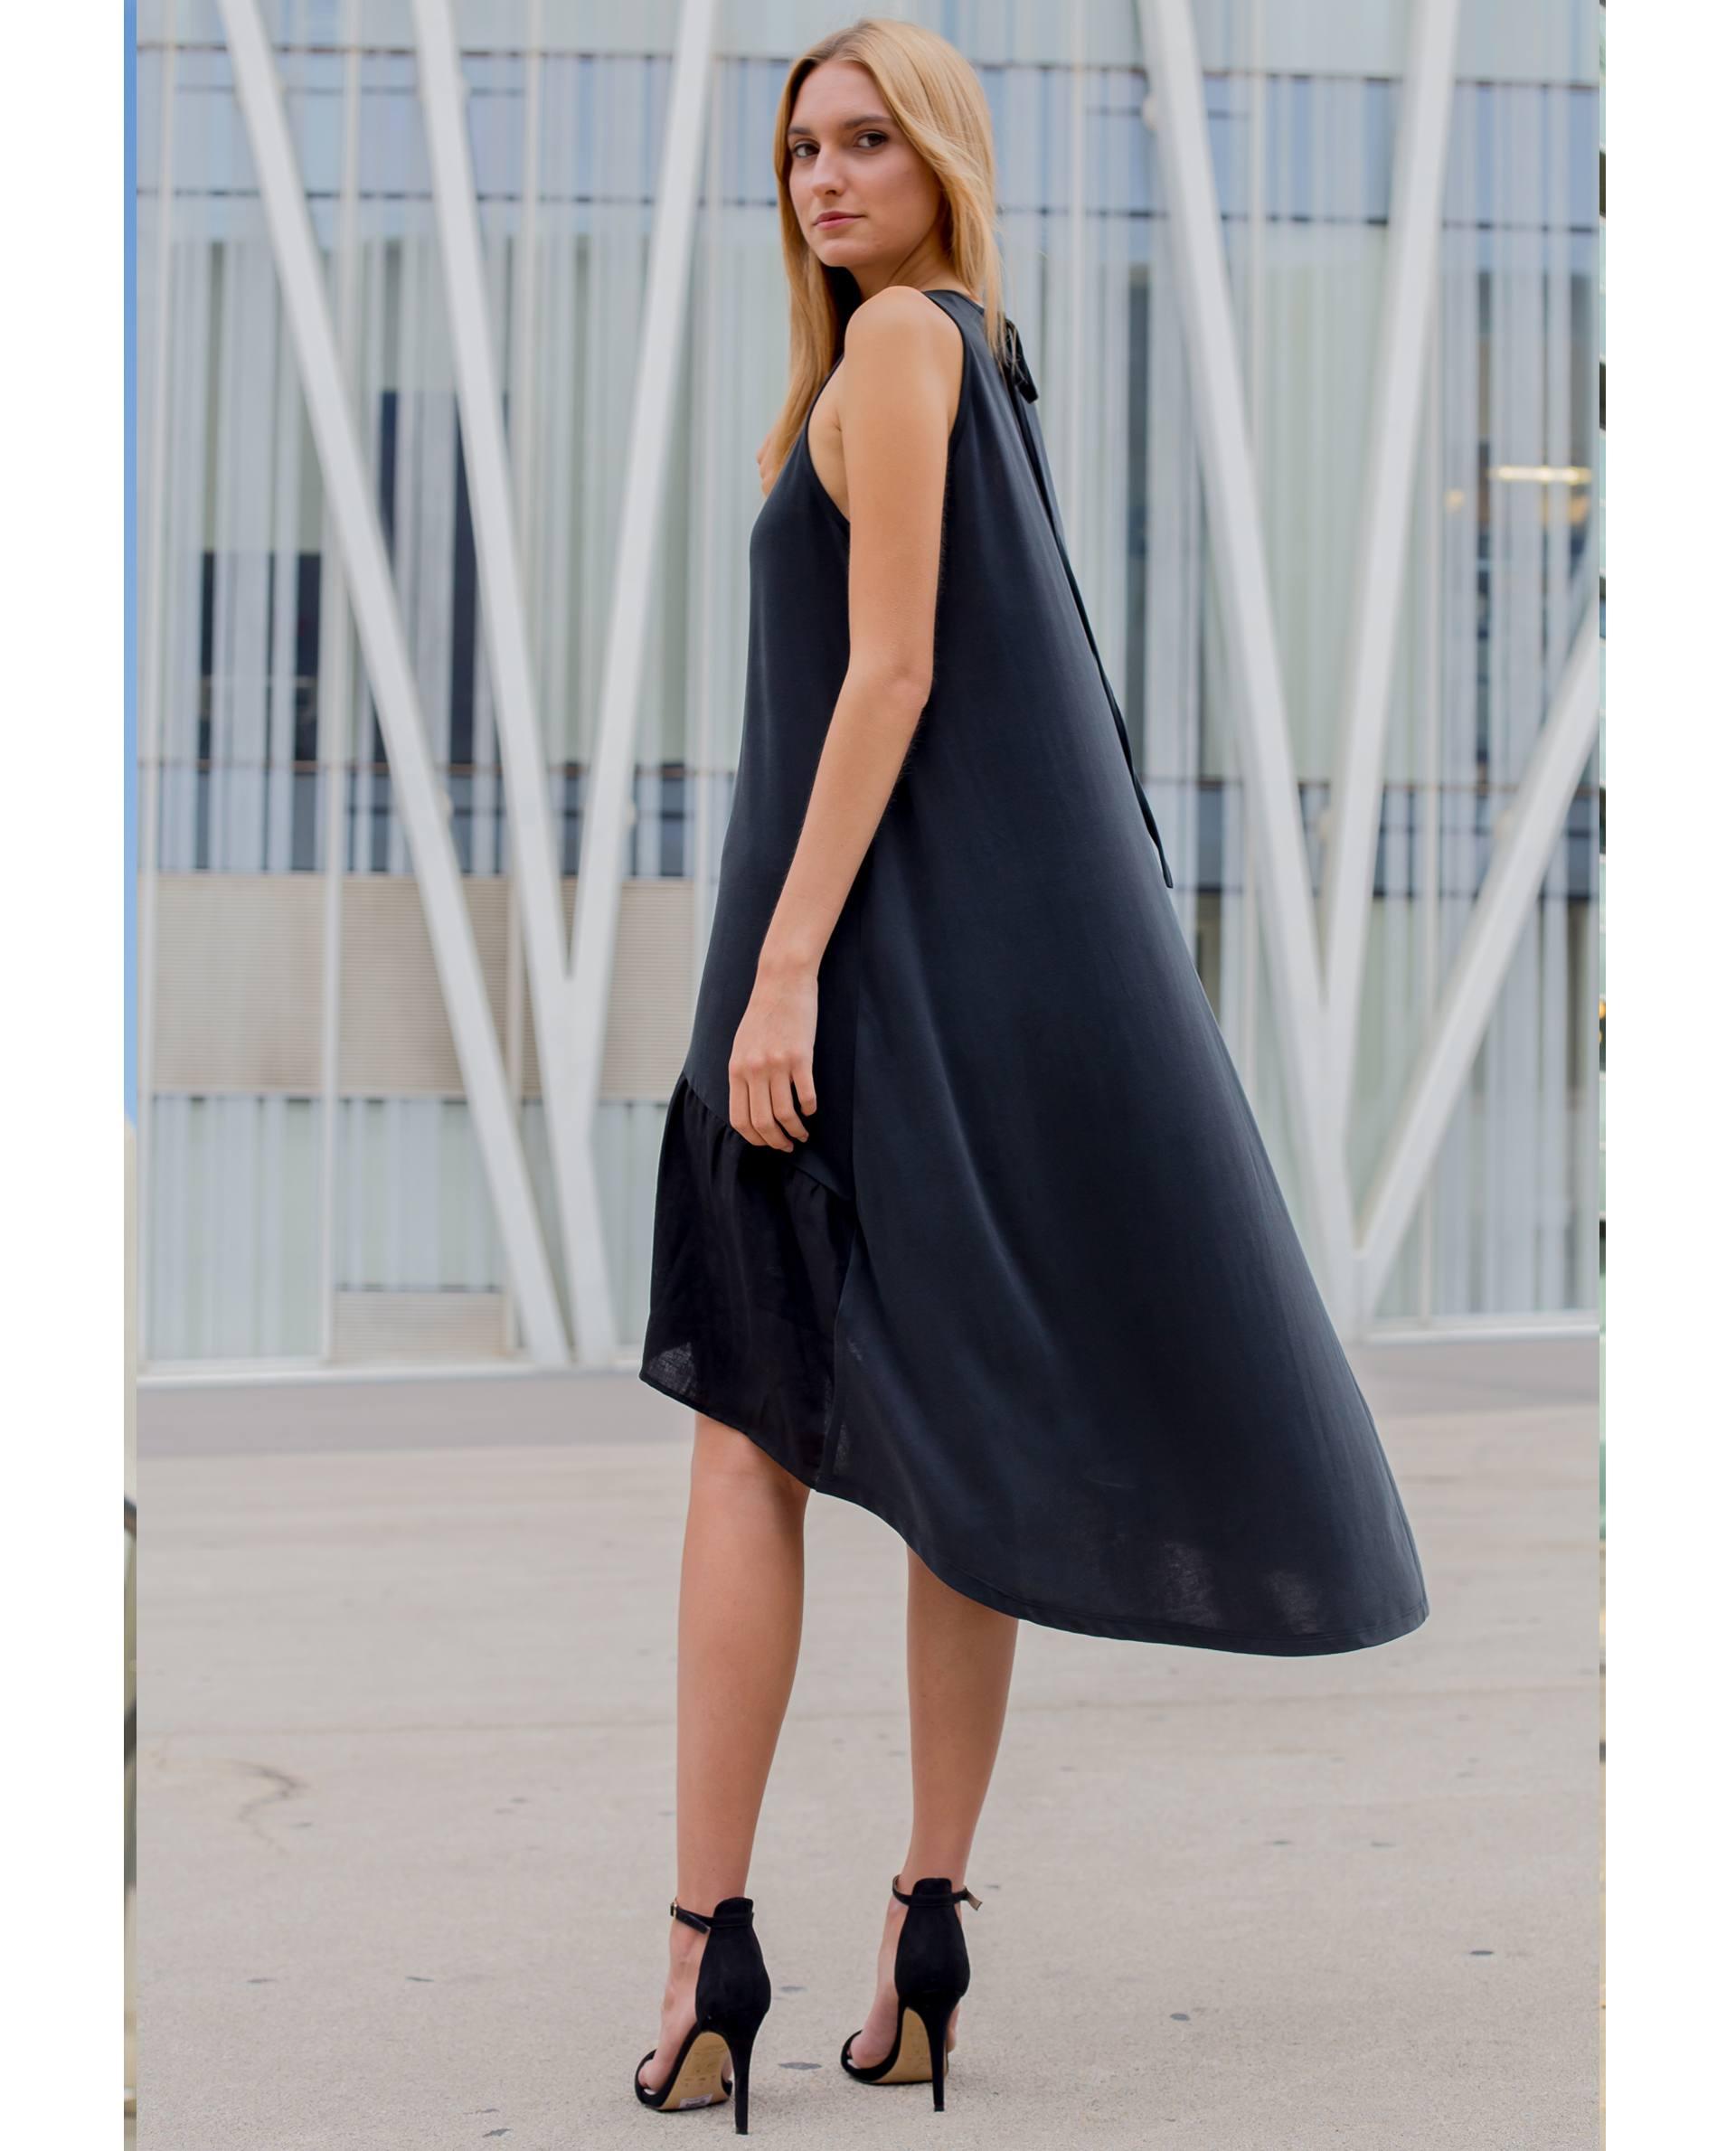 PRÊT À PORTER-SPRING/SUMMER 2018 - VESTIDOS - Vestido negro de viscosa asimétrico